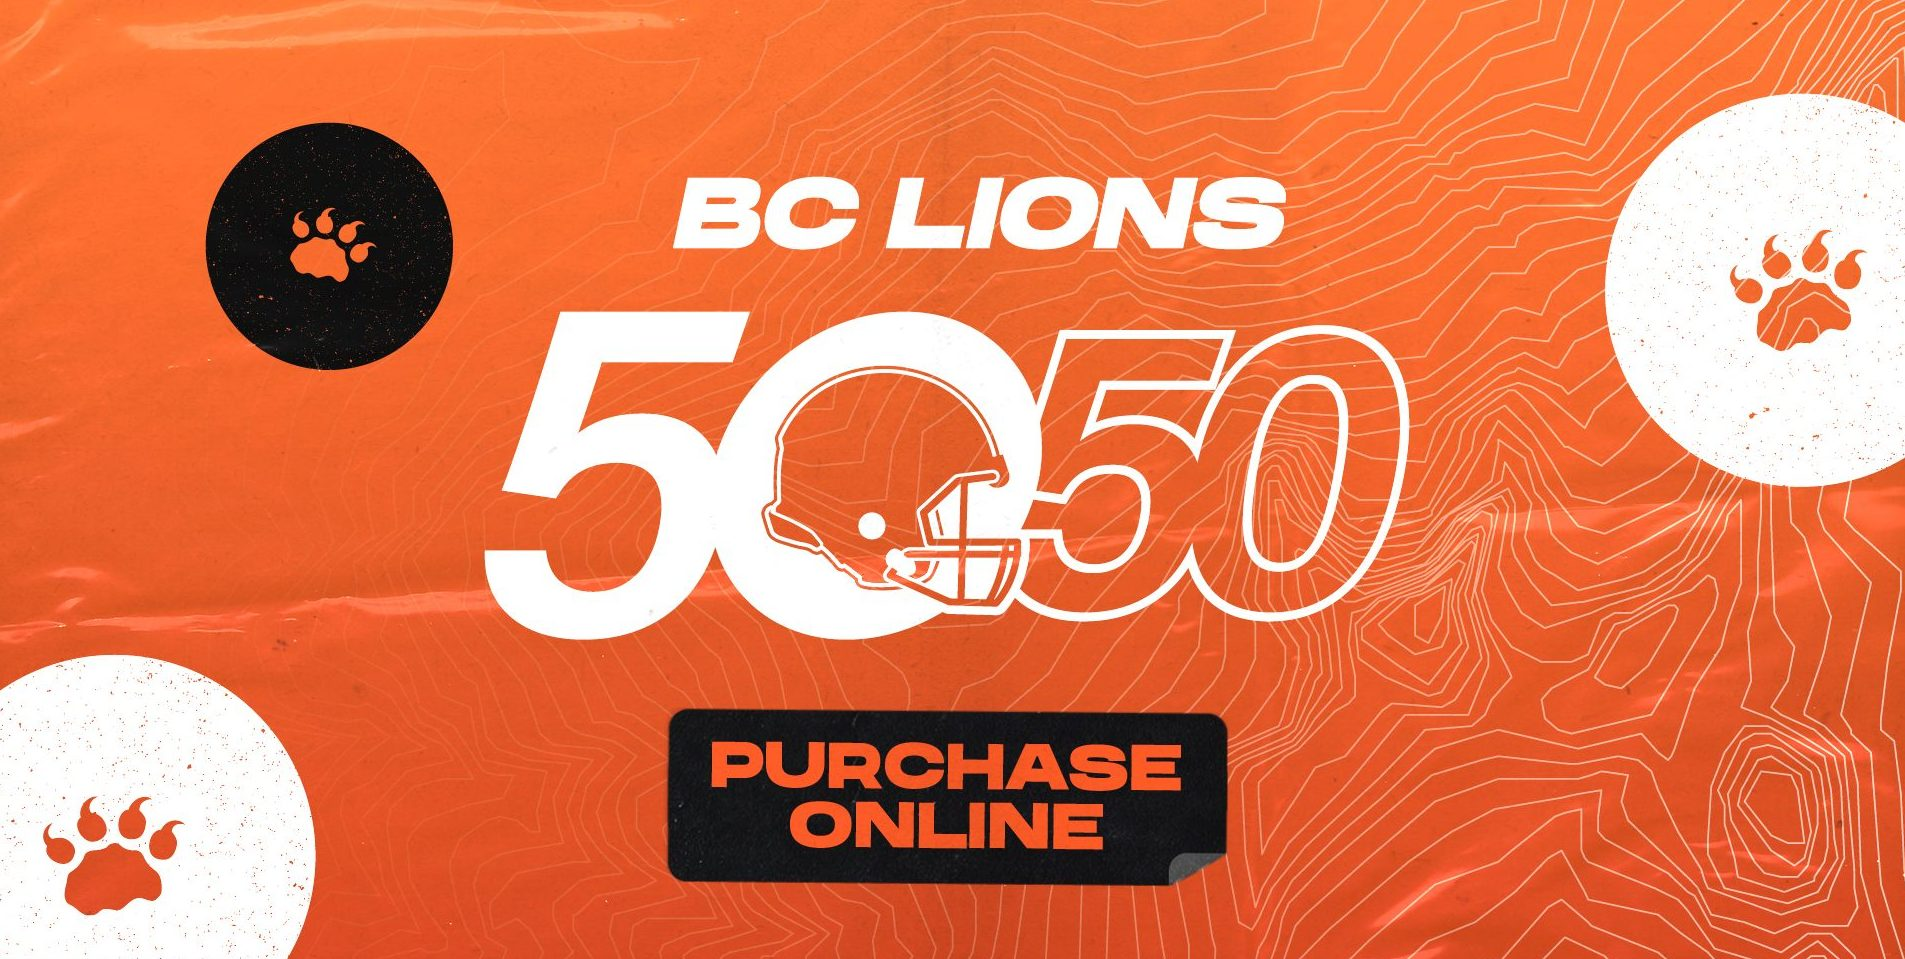 BC Lions 50/50